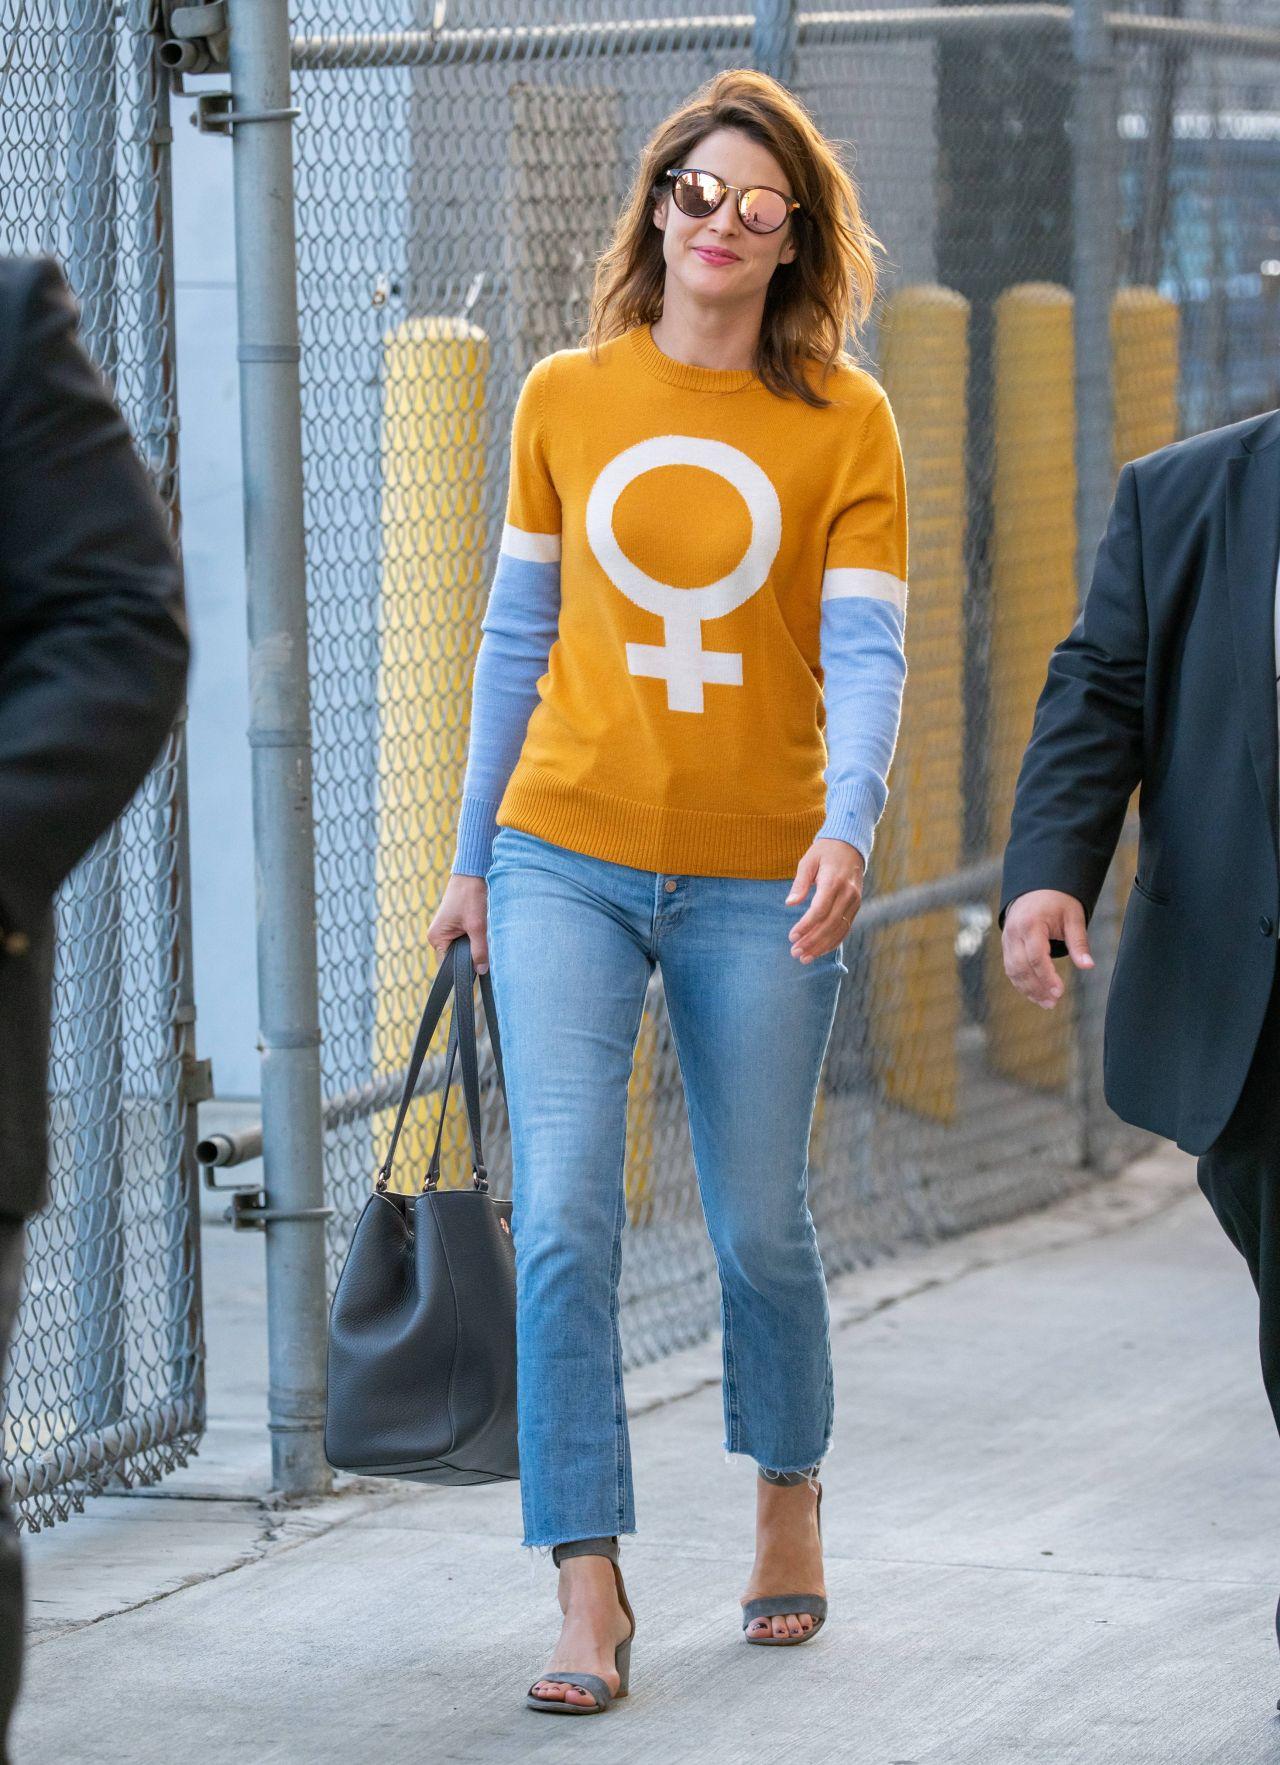 Cobie Smulders Street Style 09 25 2019